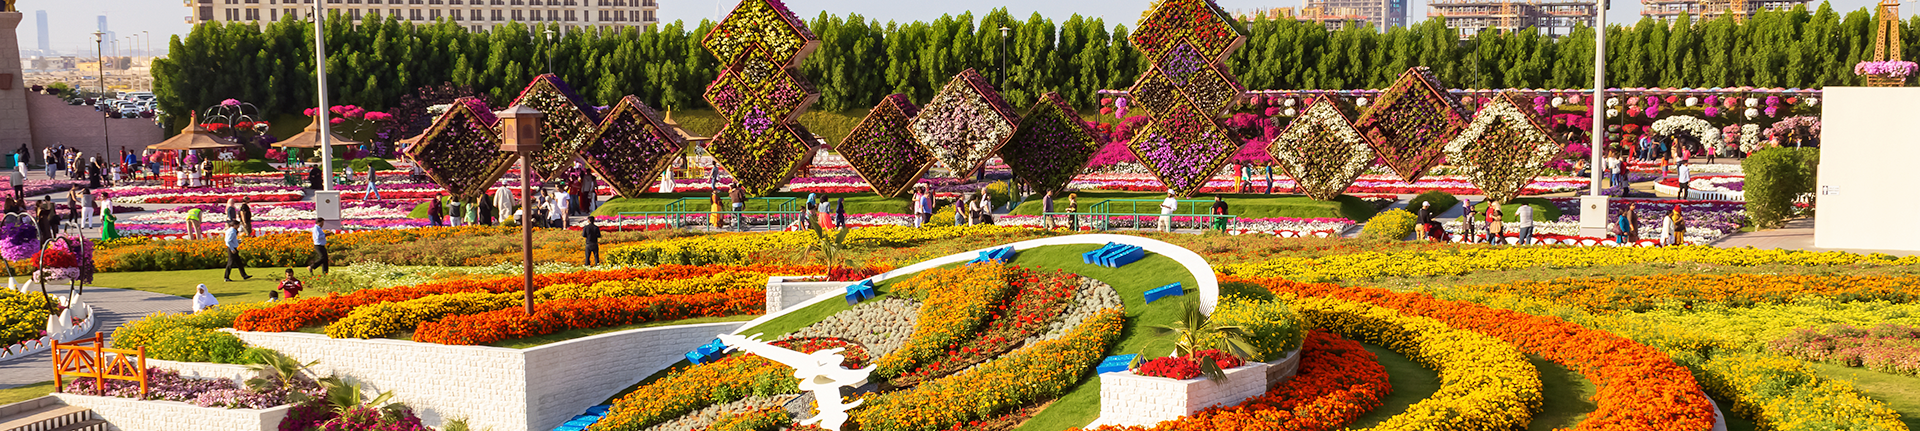 Dubai Miracle Garden, o maior jardim do mundo